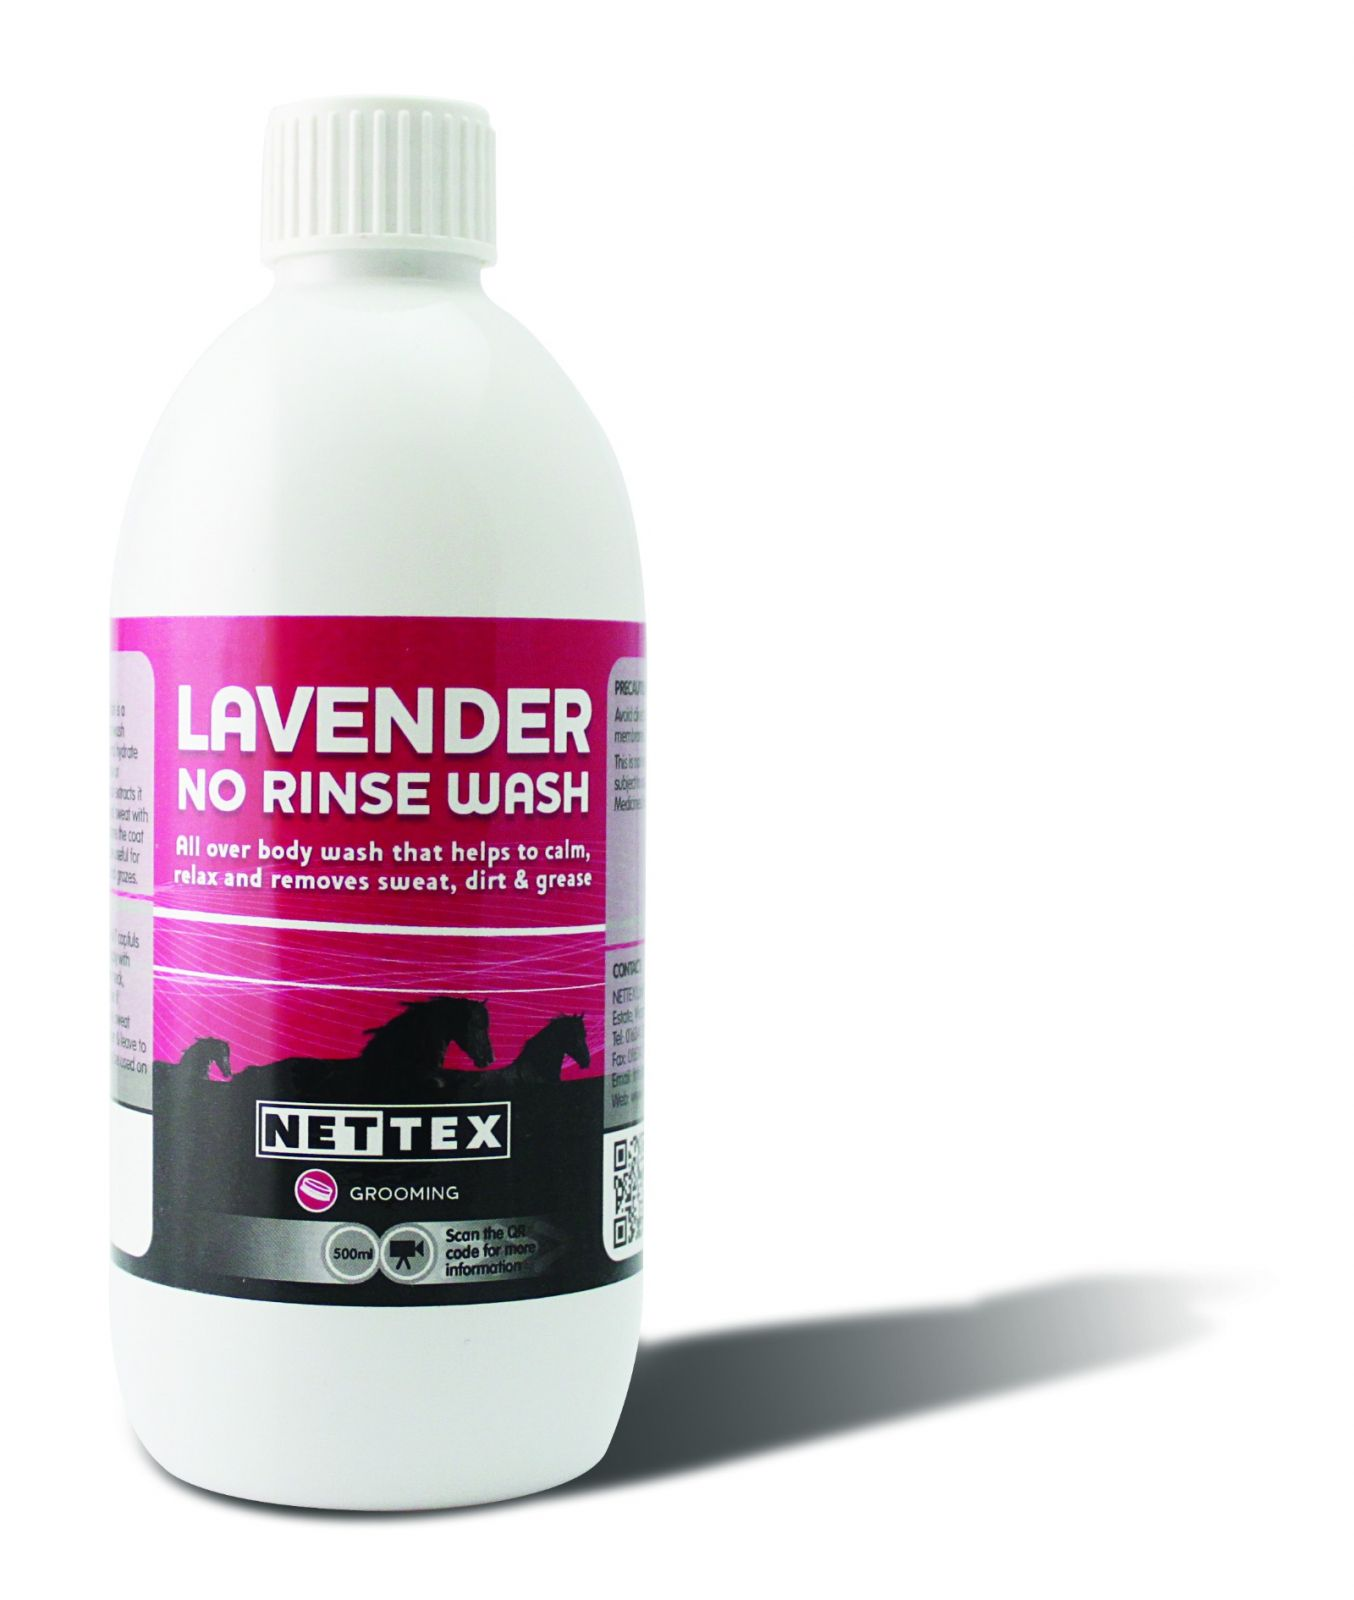 Nettex Lavender Wash No Rinse 500ml